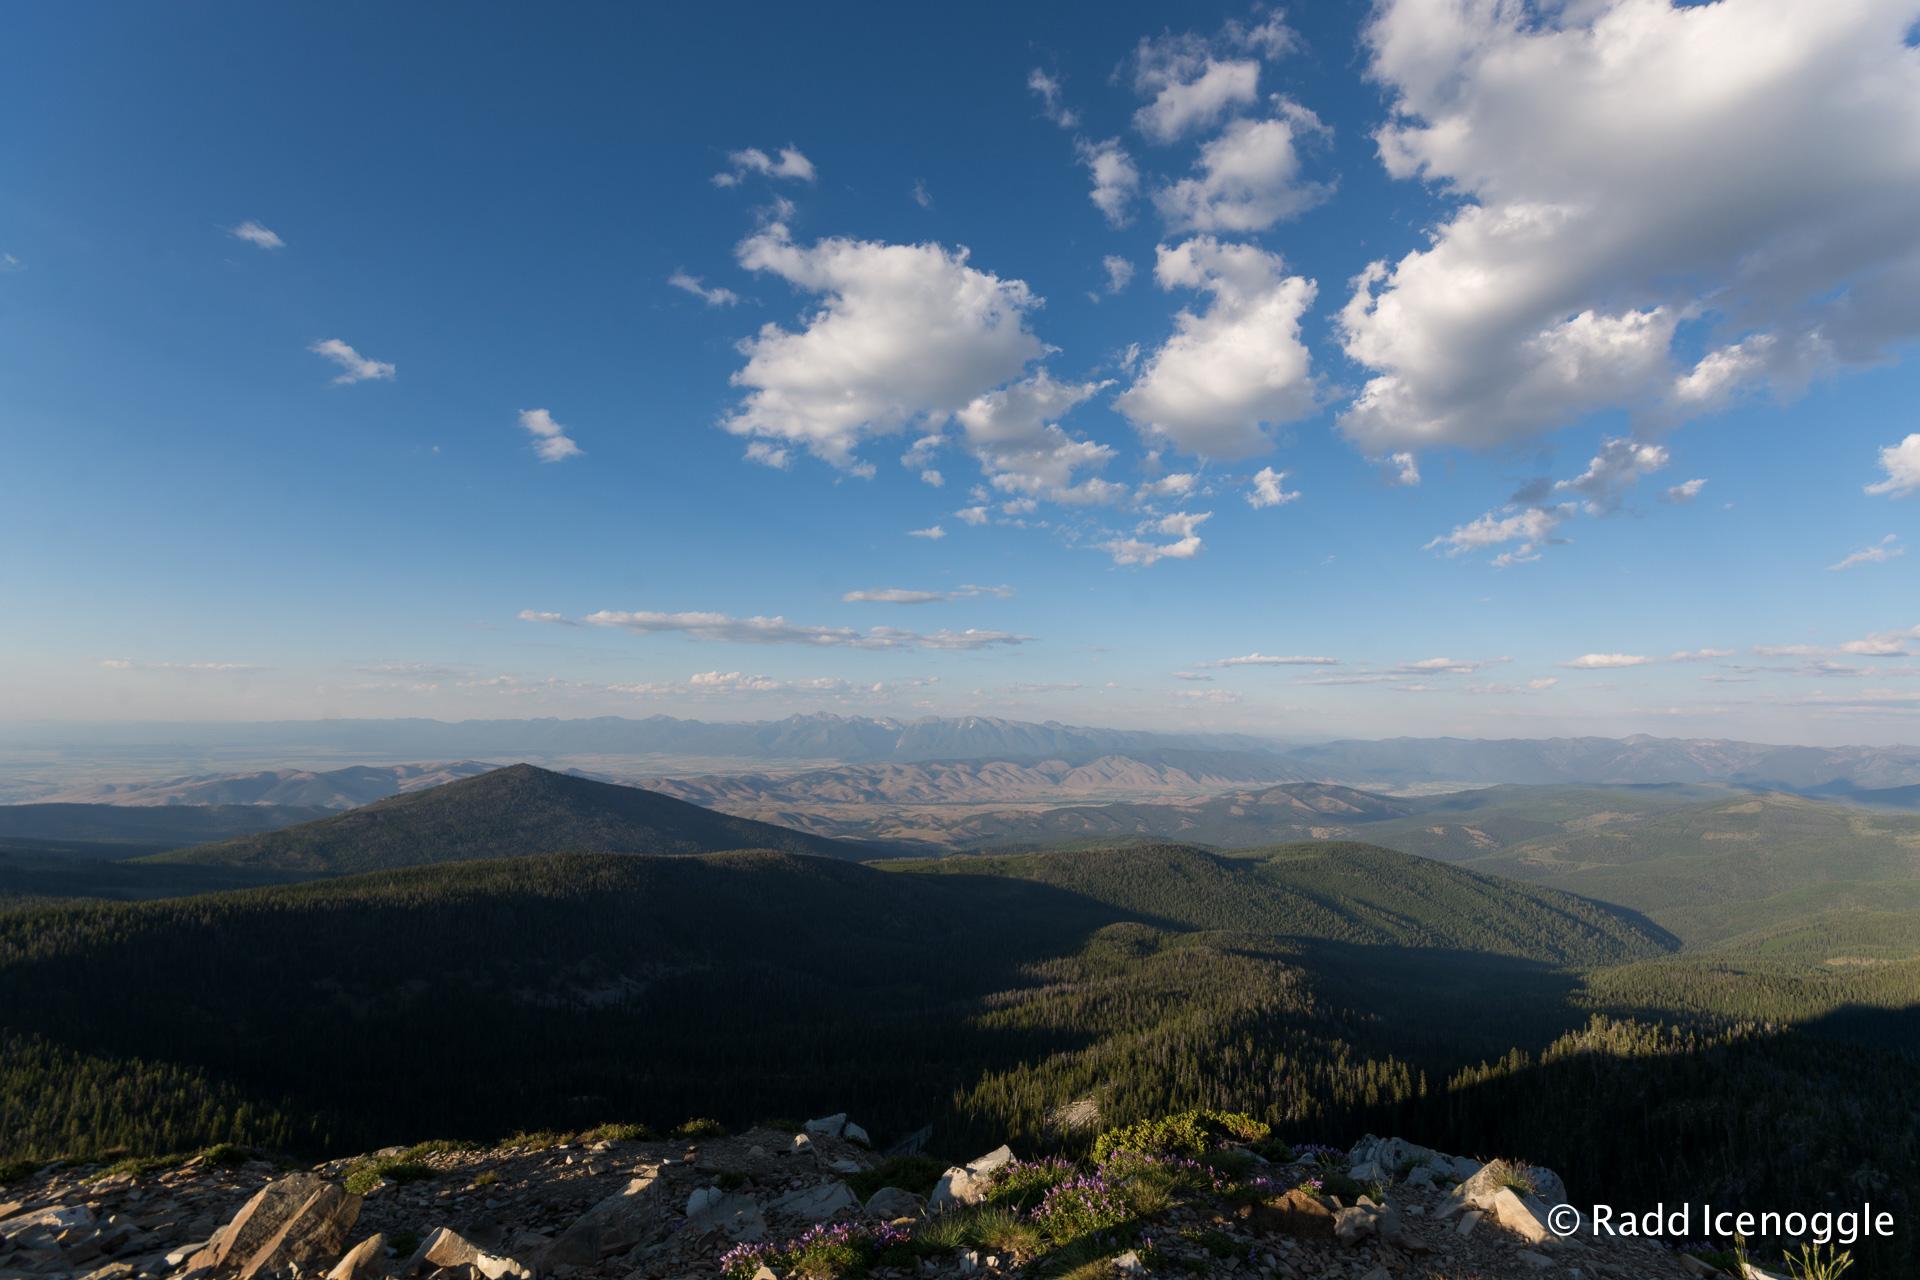 Mission Range from Ch-paa-qn Peak